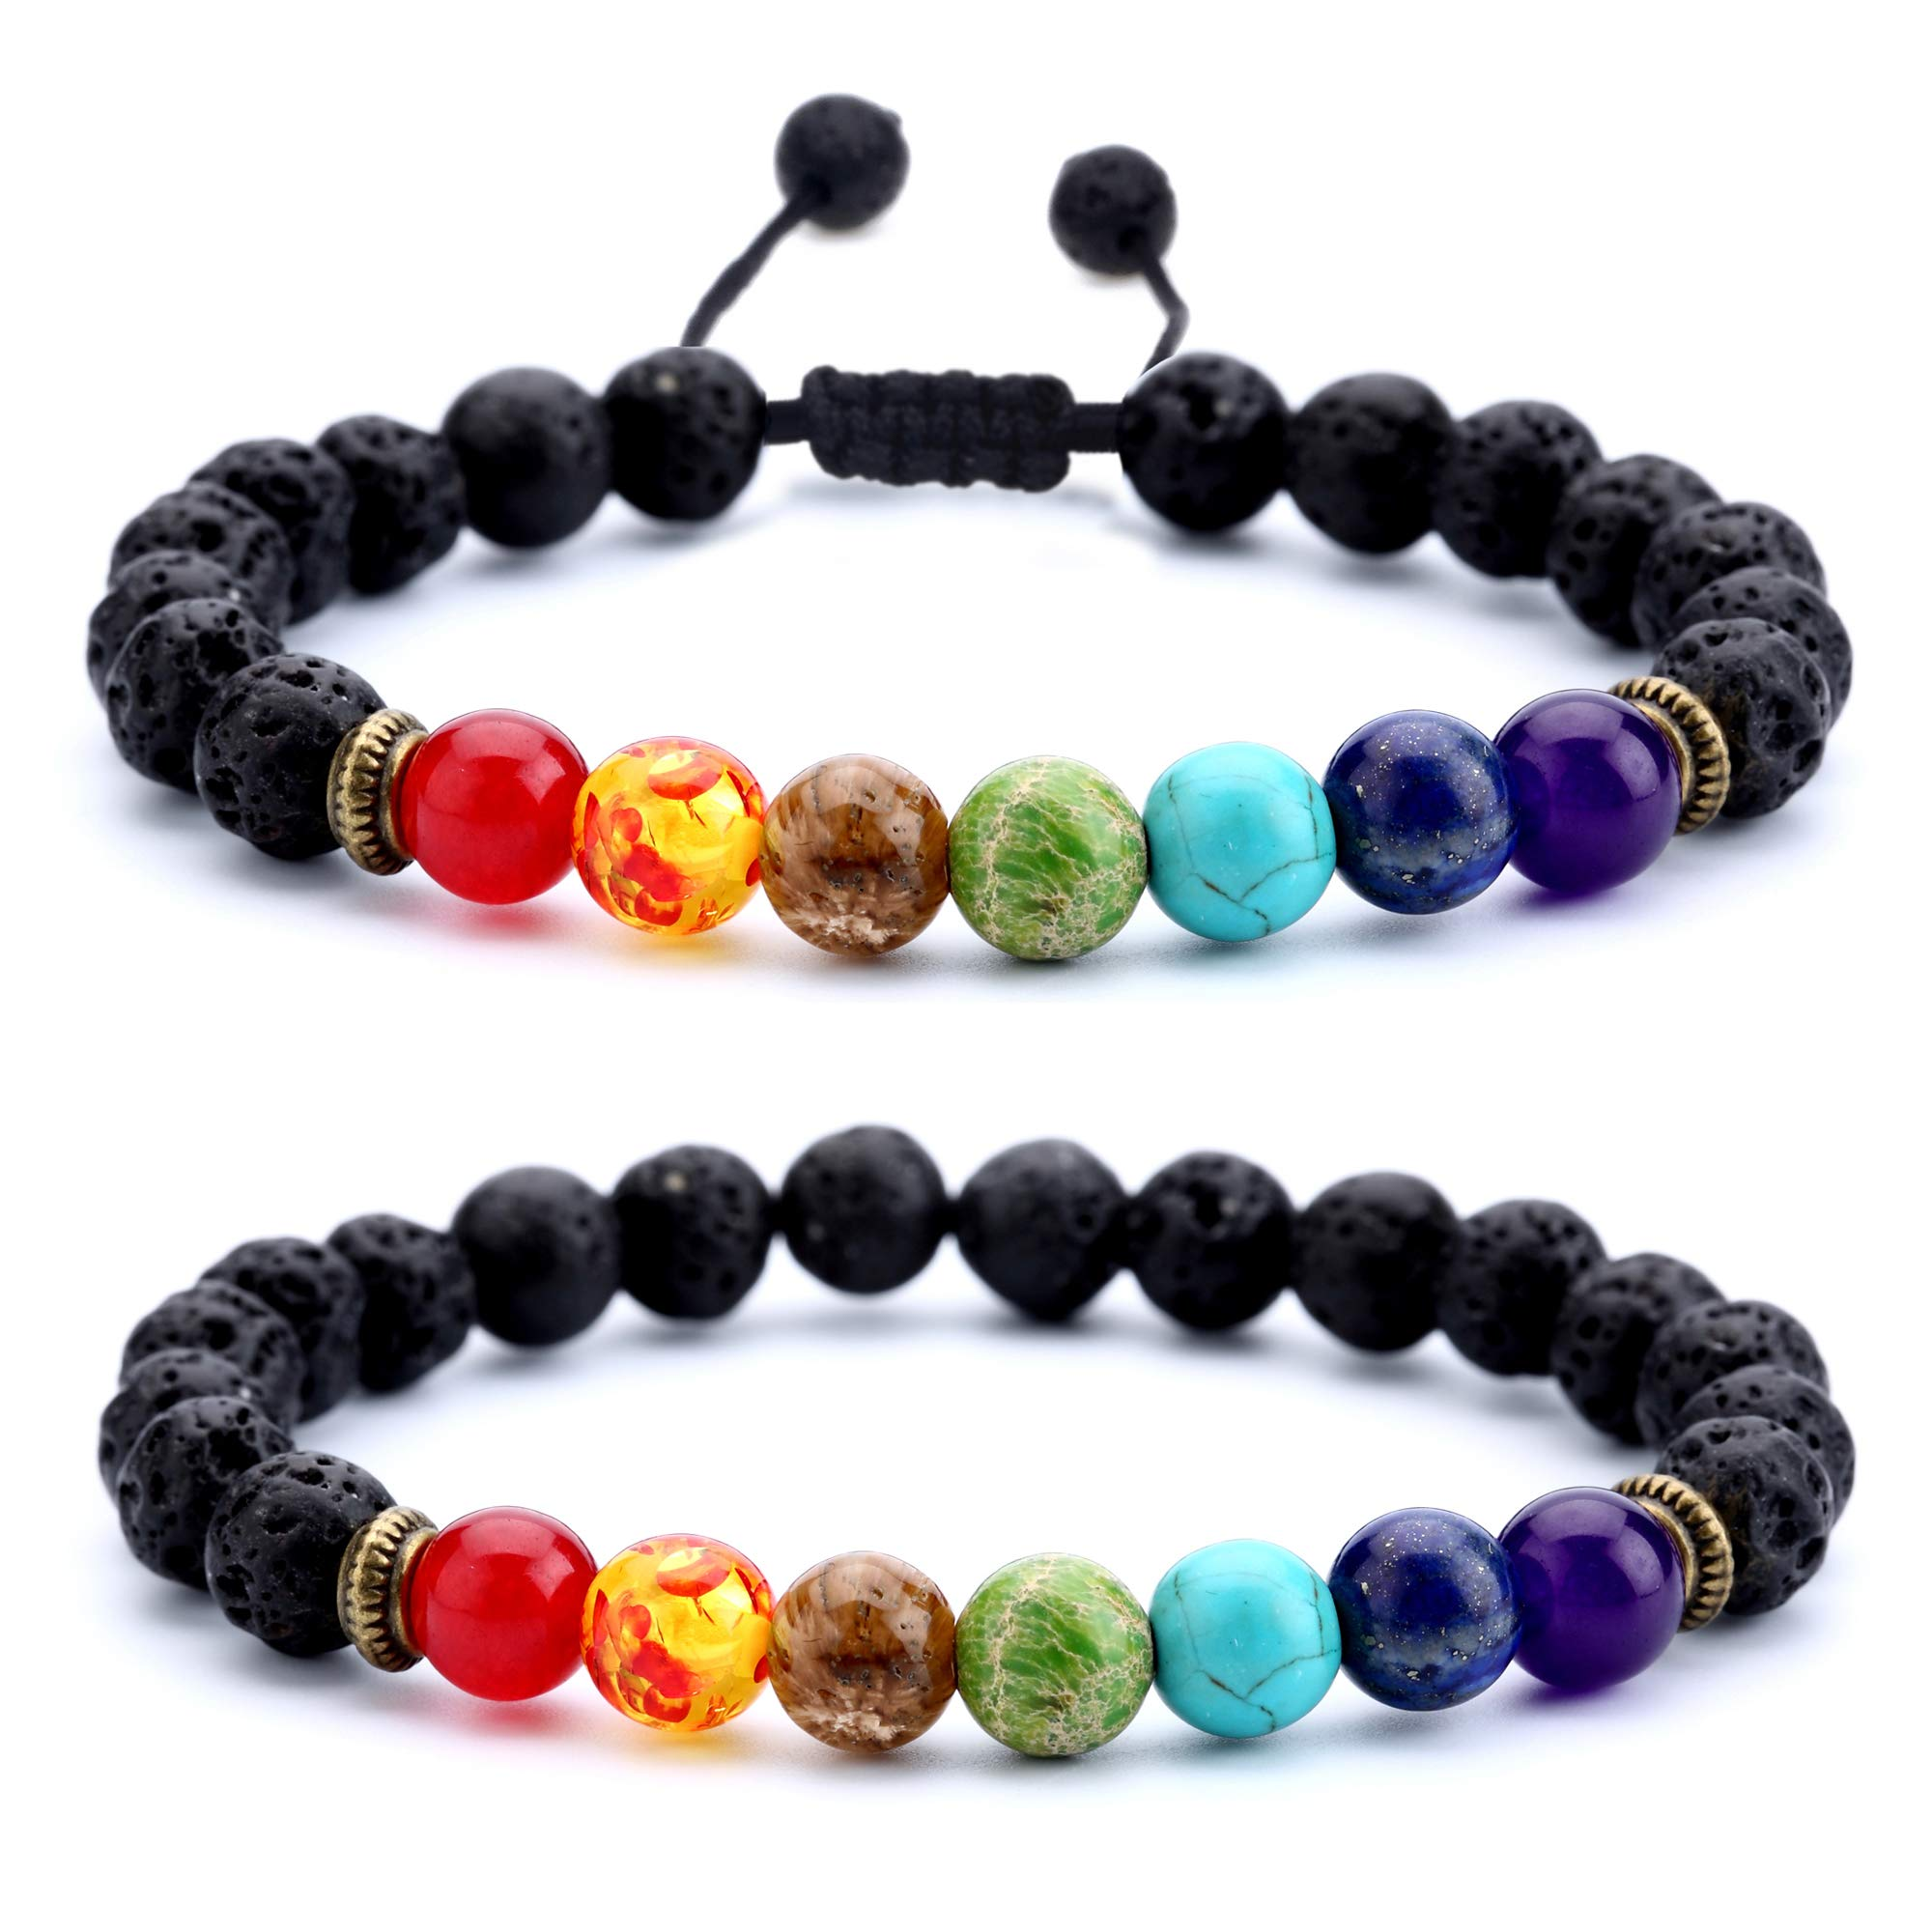 Hamoery Men Women 8mm Lava Rock Chakra Beads Bracelet Set Braided Rope Natural Stone Yoga Bracelet Bangle (Set 1)